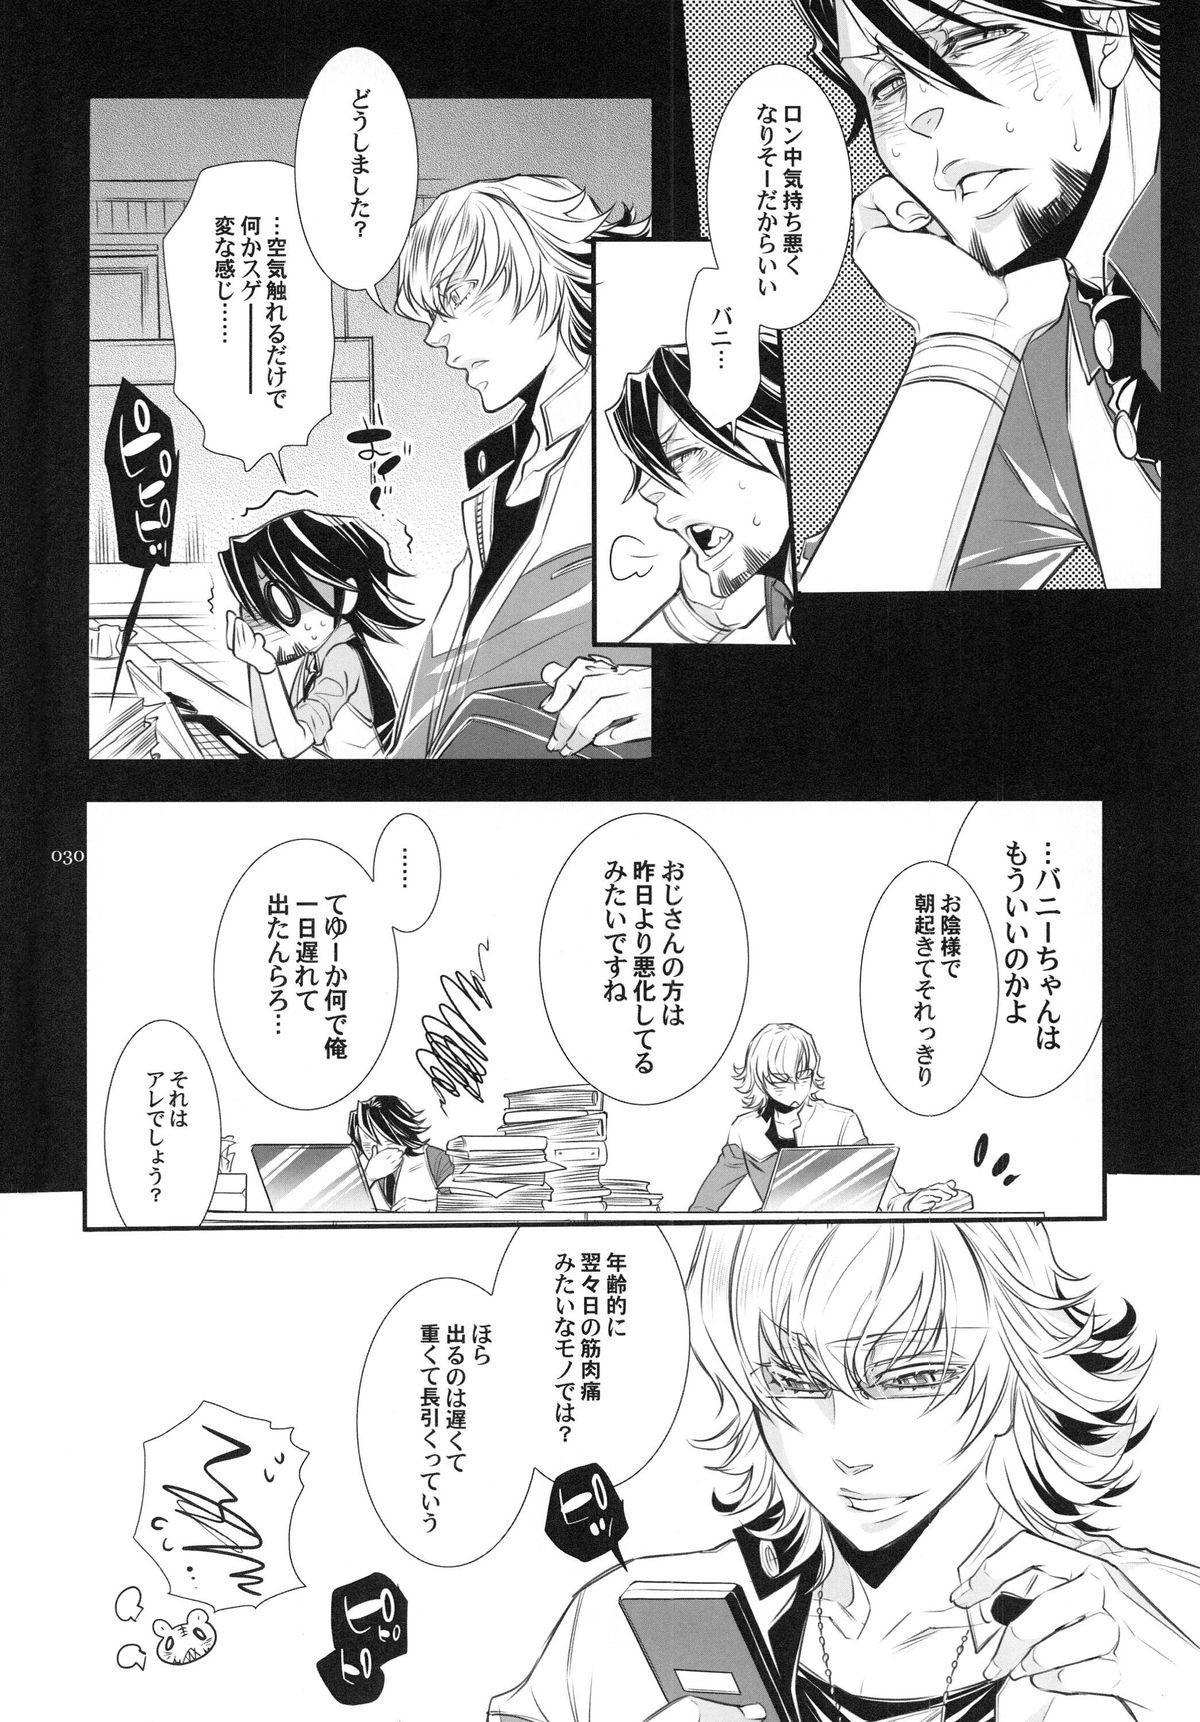 Bunny-chan to Iikoto Shiyokka 29